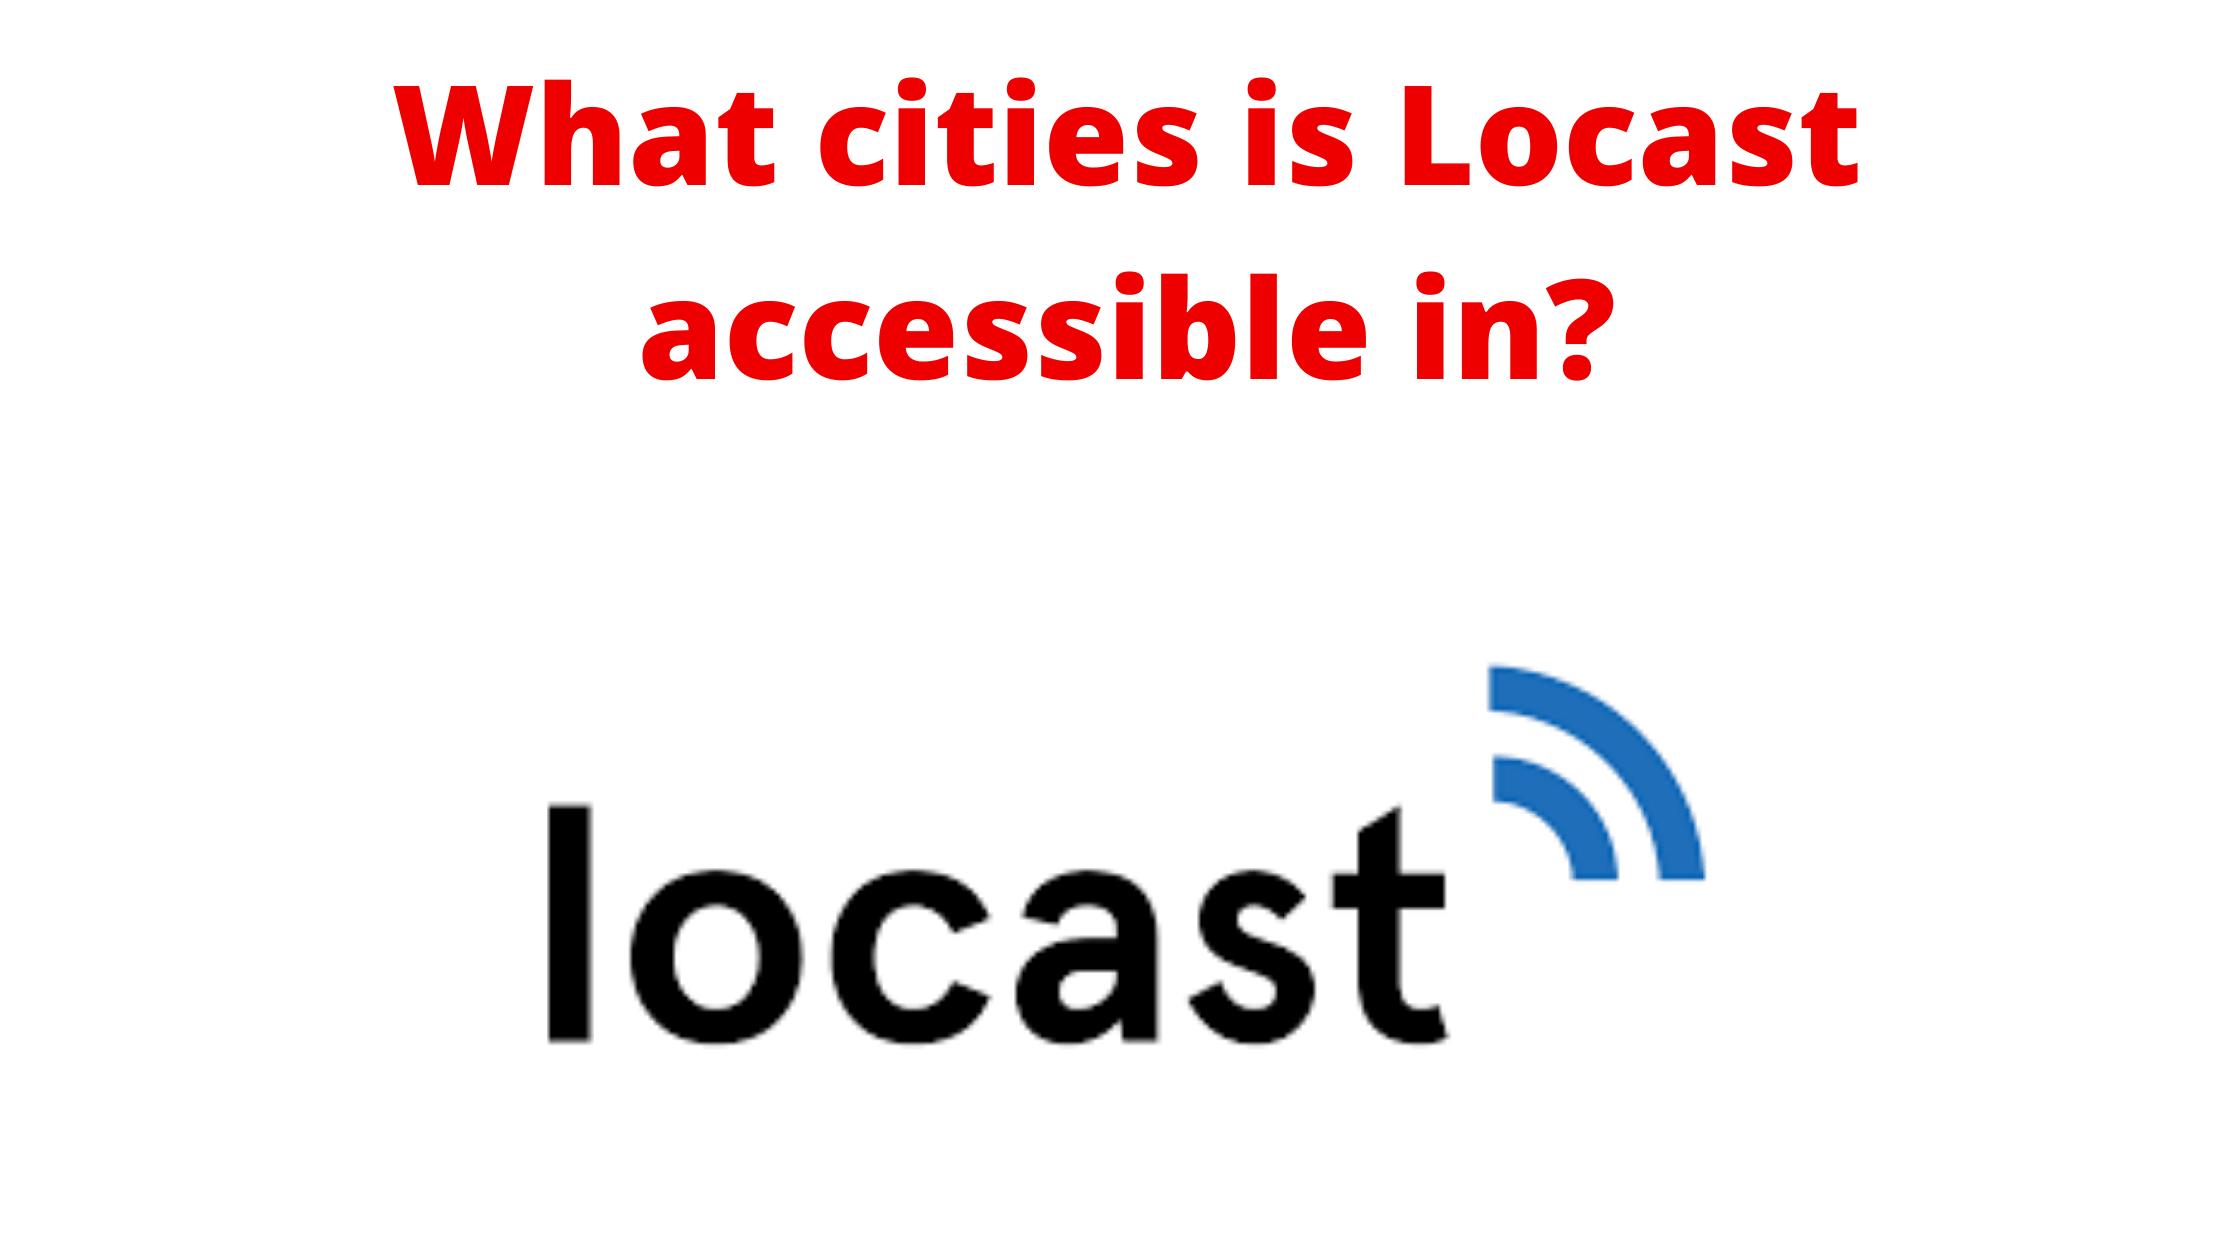 locast cities